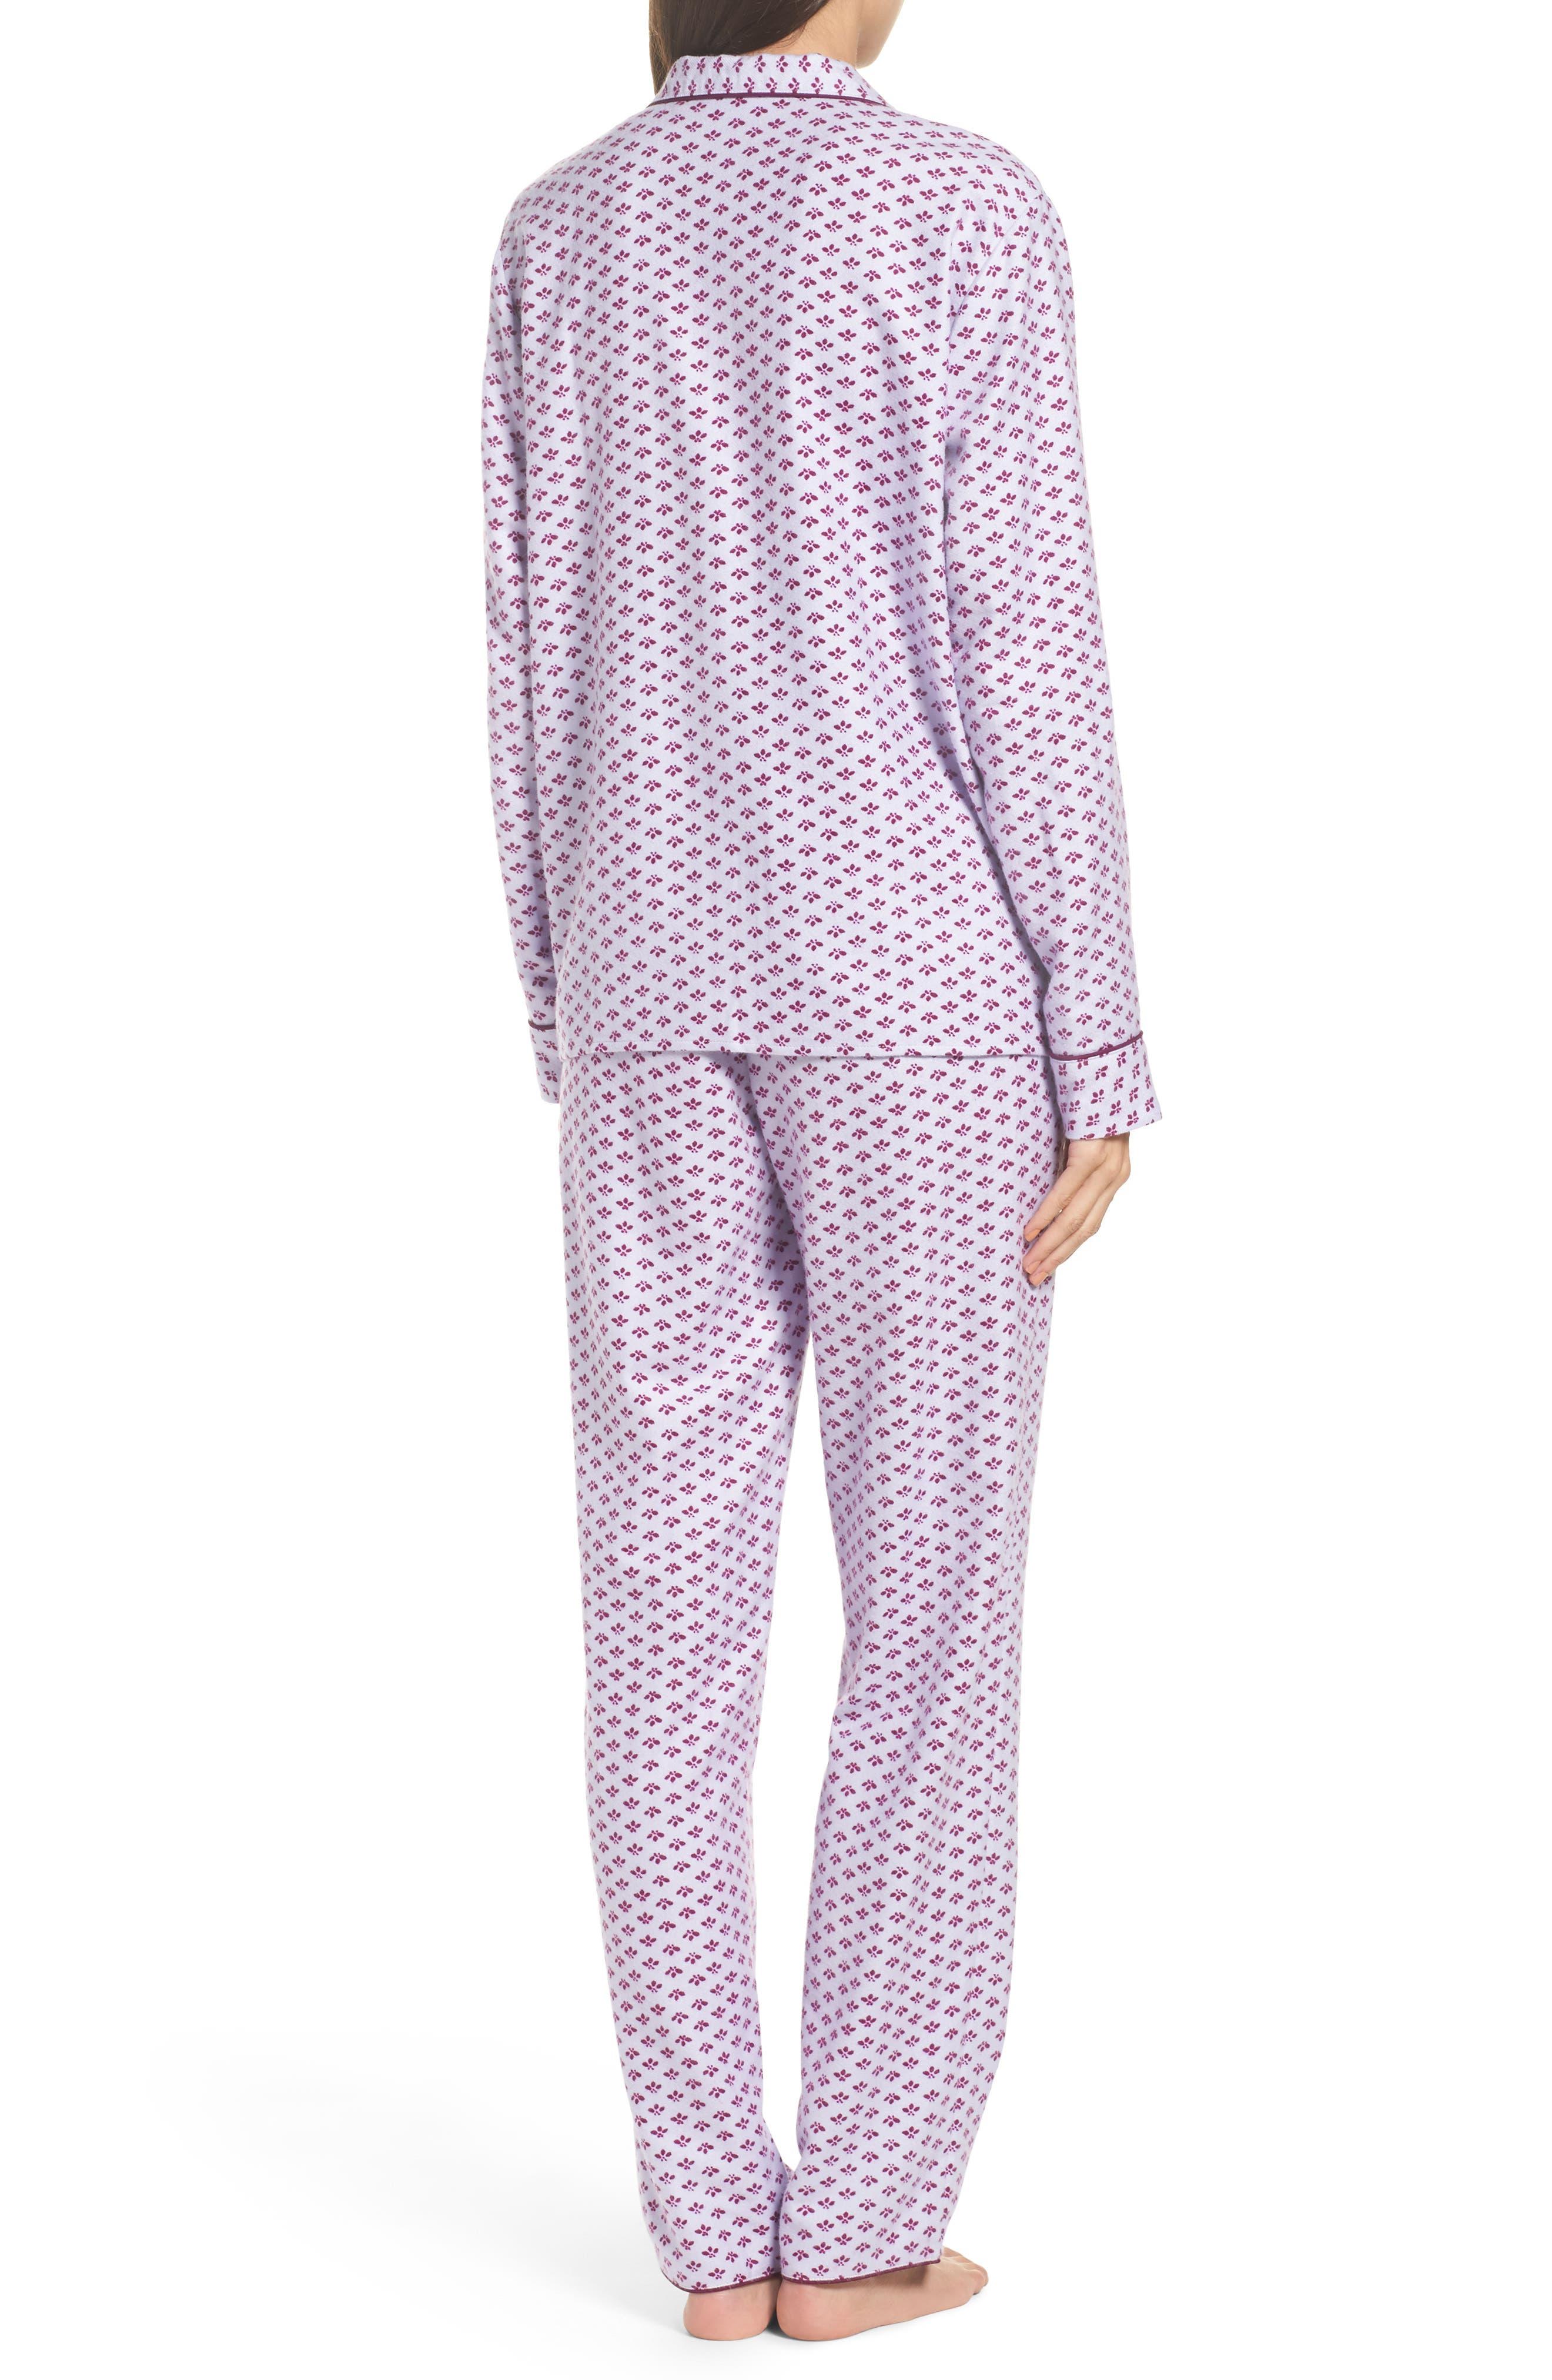 Lingerie Starlight Flannel Pajamas,                             Alternate thumbnail 9, color,